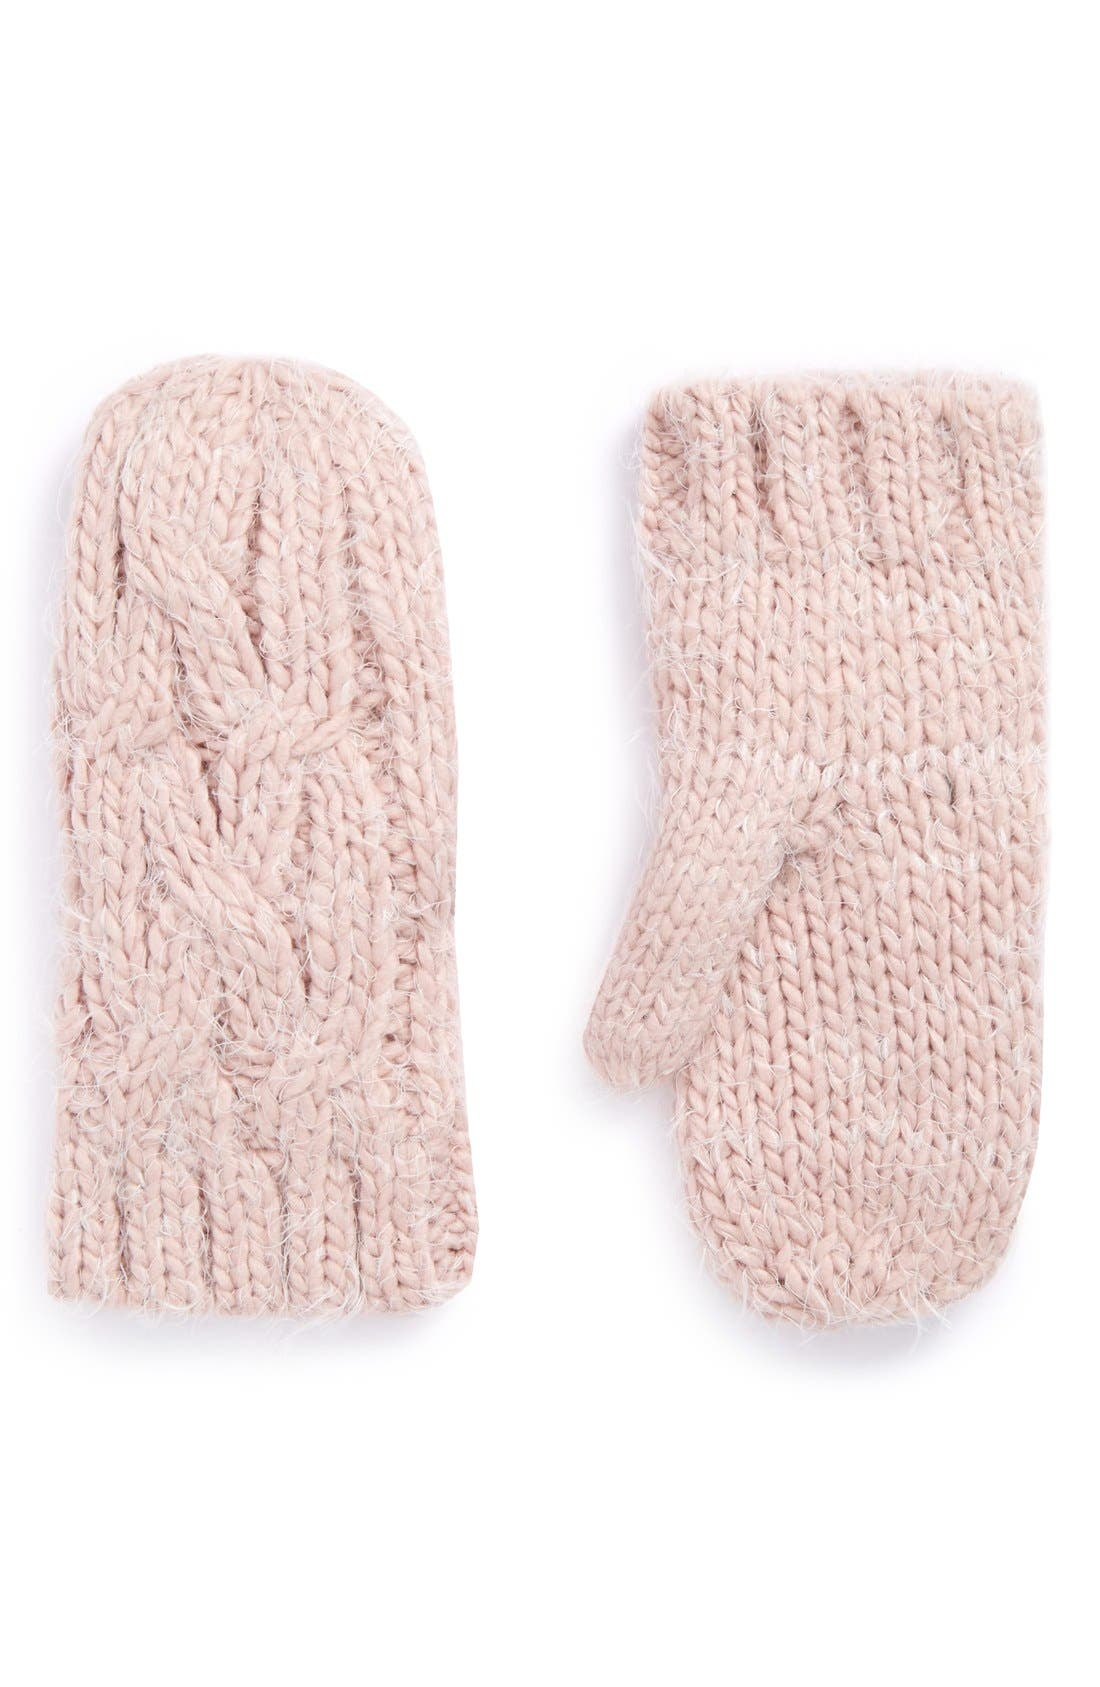 Main Image - Ruby & Bloom 'Eyelash' Cable Knit Mittens (Big Girls)